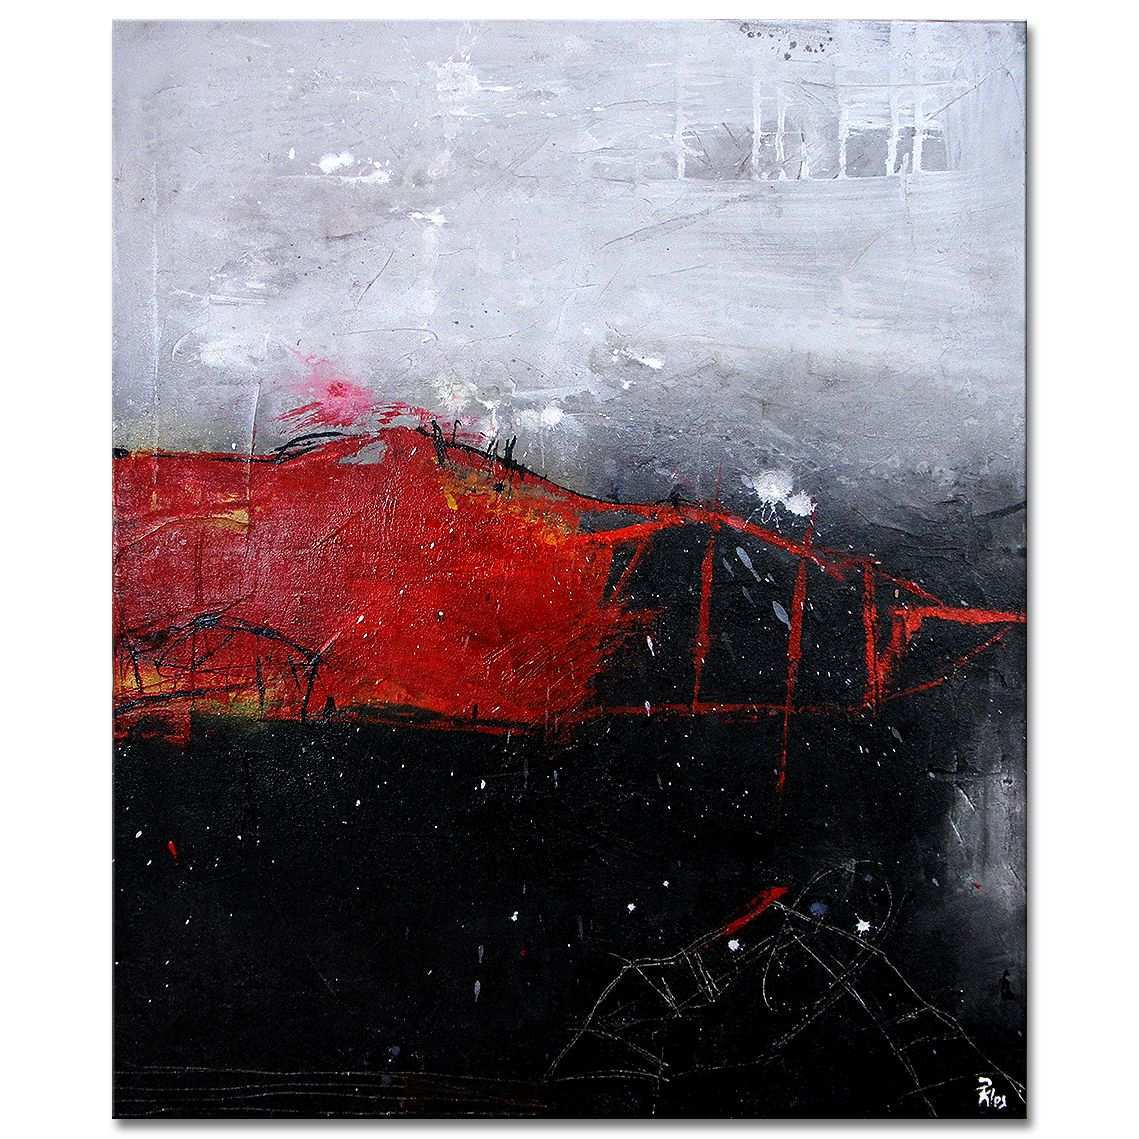 Acrylkunst Von Petra Klos Bridge Over Troubled Water Acrylmalerei Abstrakt Abstrakte Kunst Gemalde Abstrakte Malerei